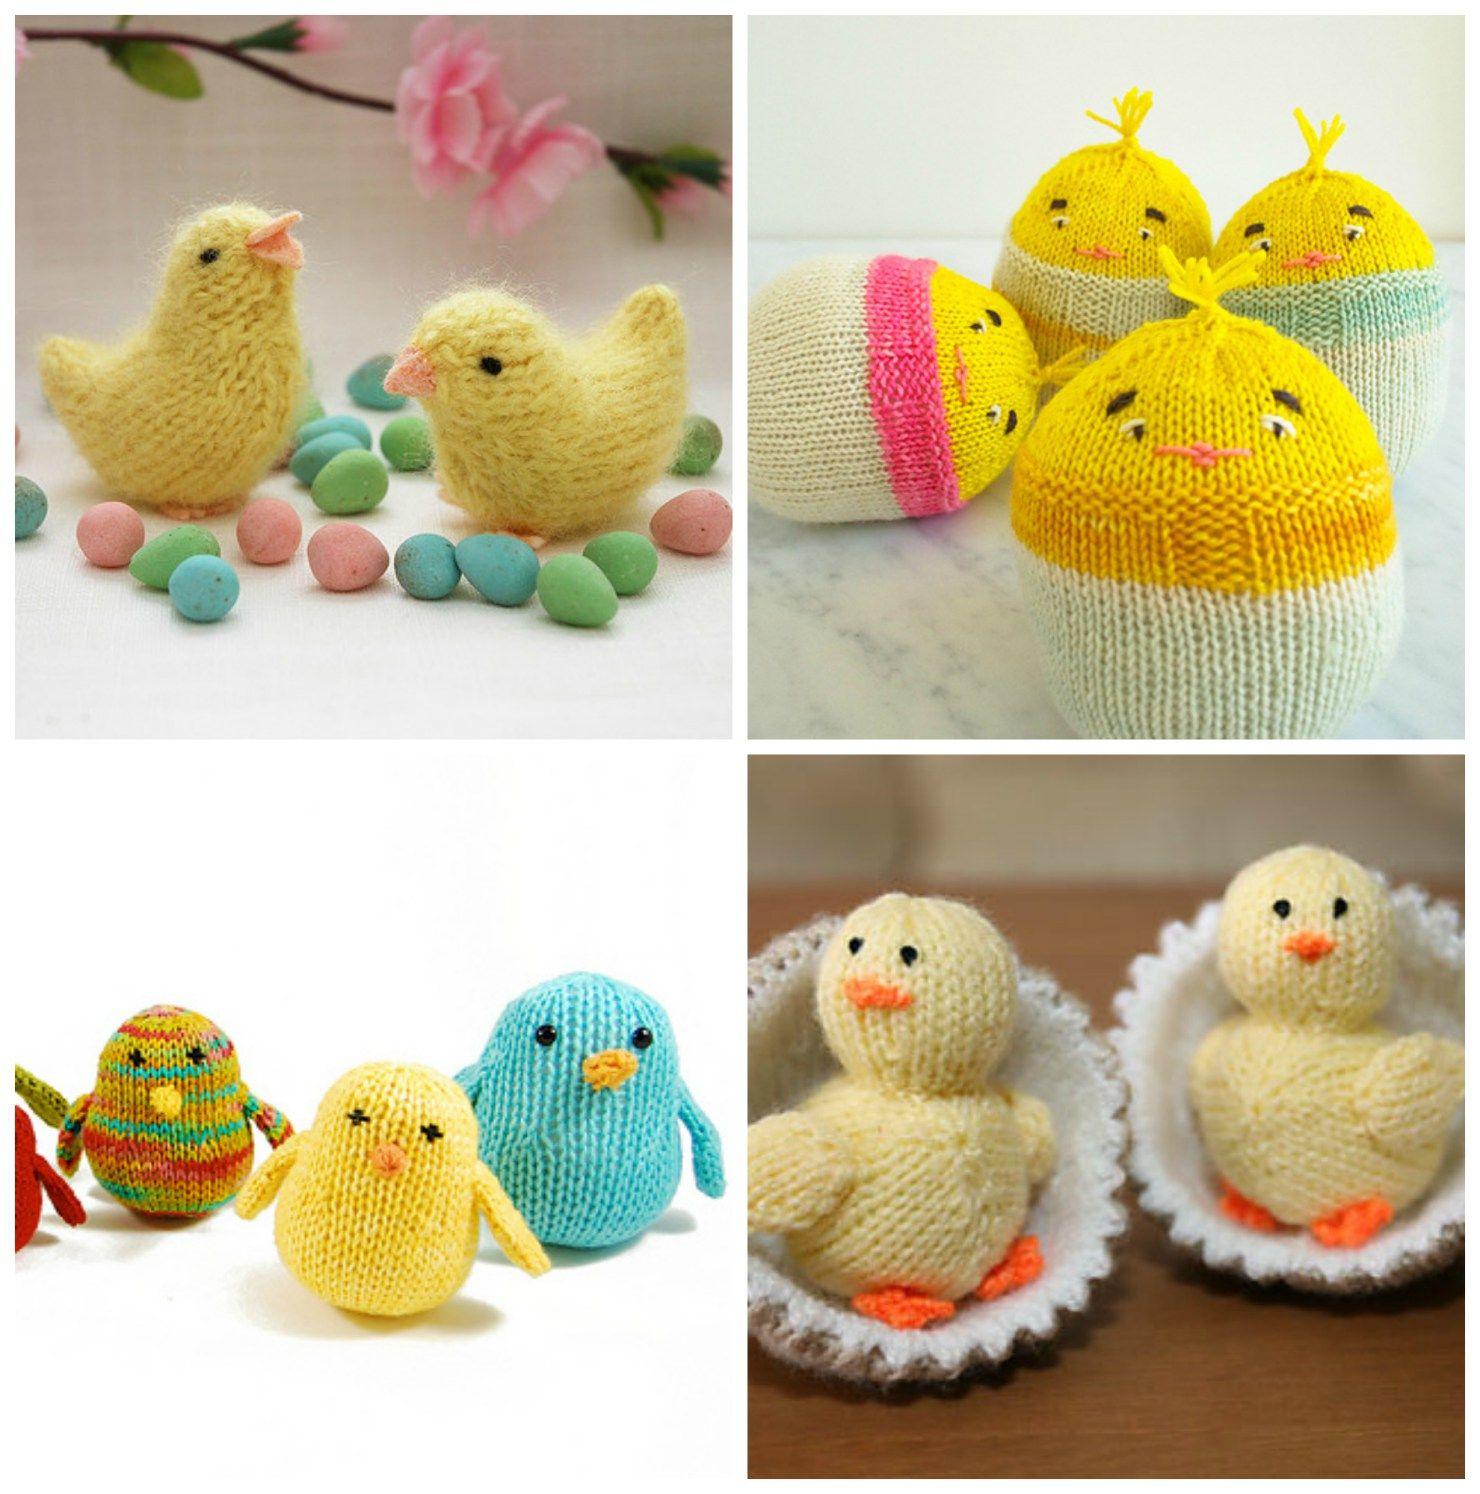 Easter Knitting Ideas: Easter Chick Patterns   knittedbliss.com